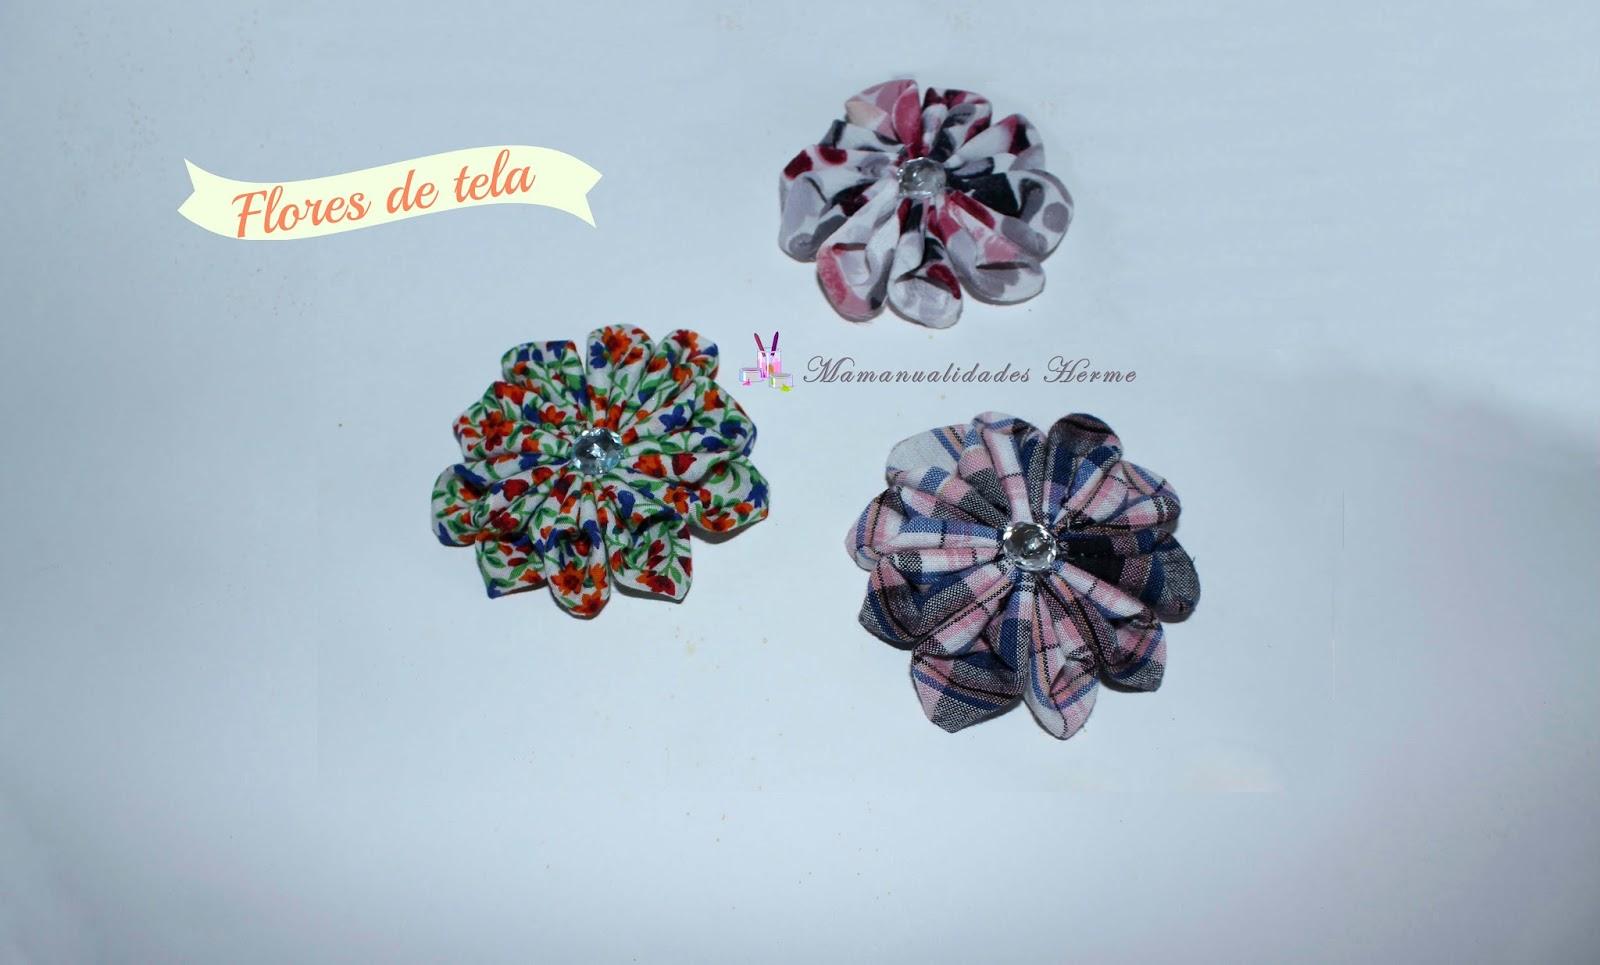 Manualidades herme como hacer flores de tela - Como hacer manualidades con tela ...